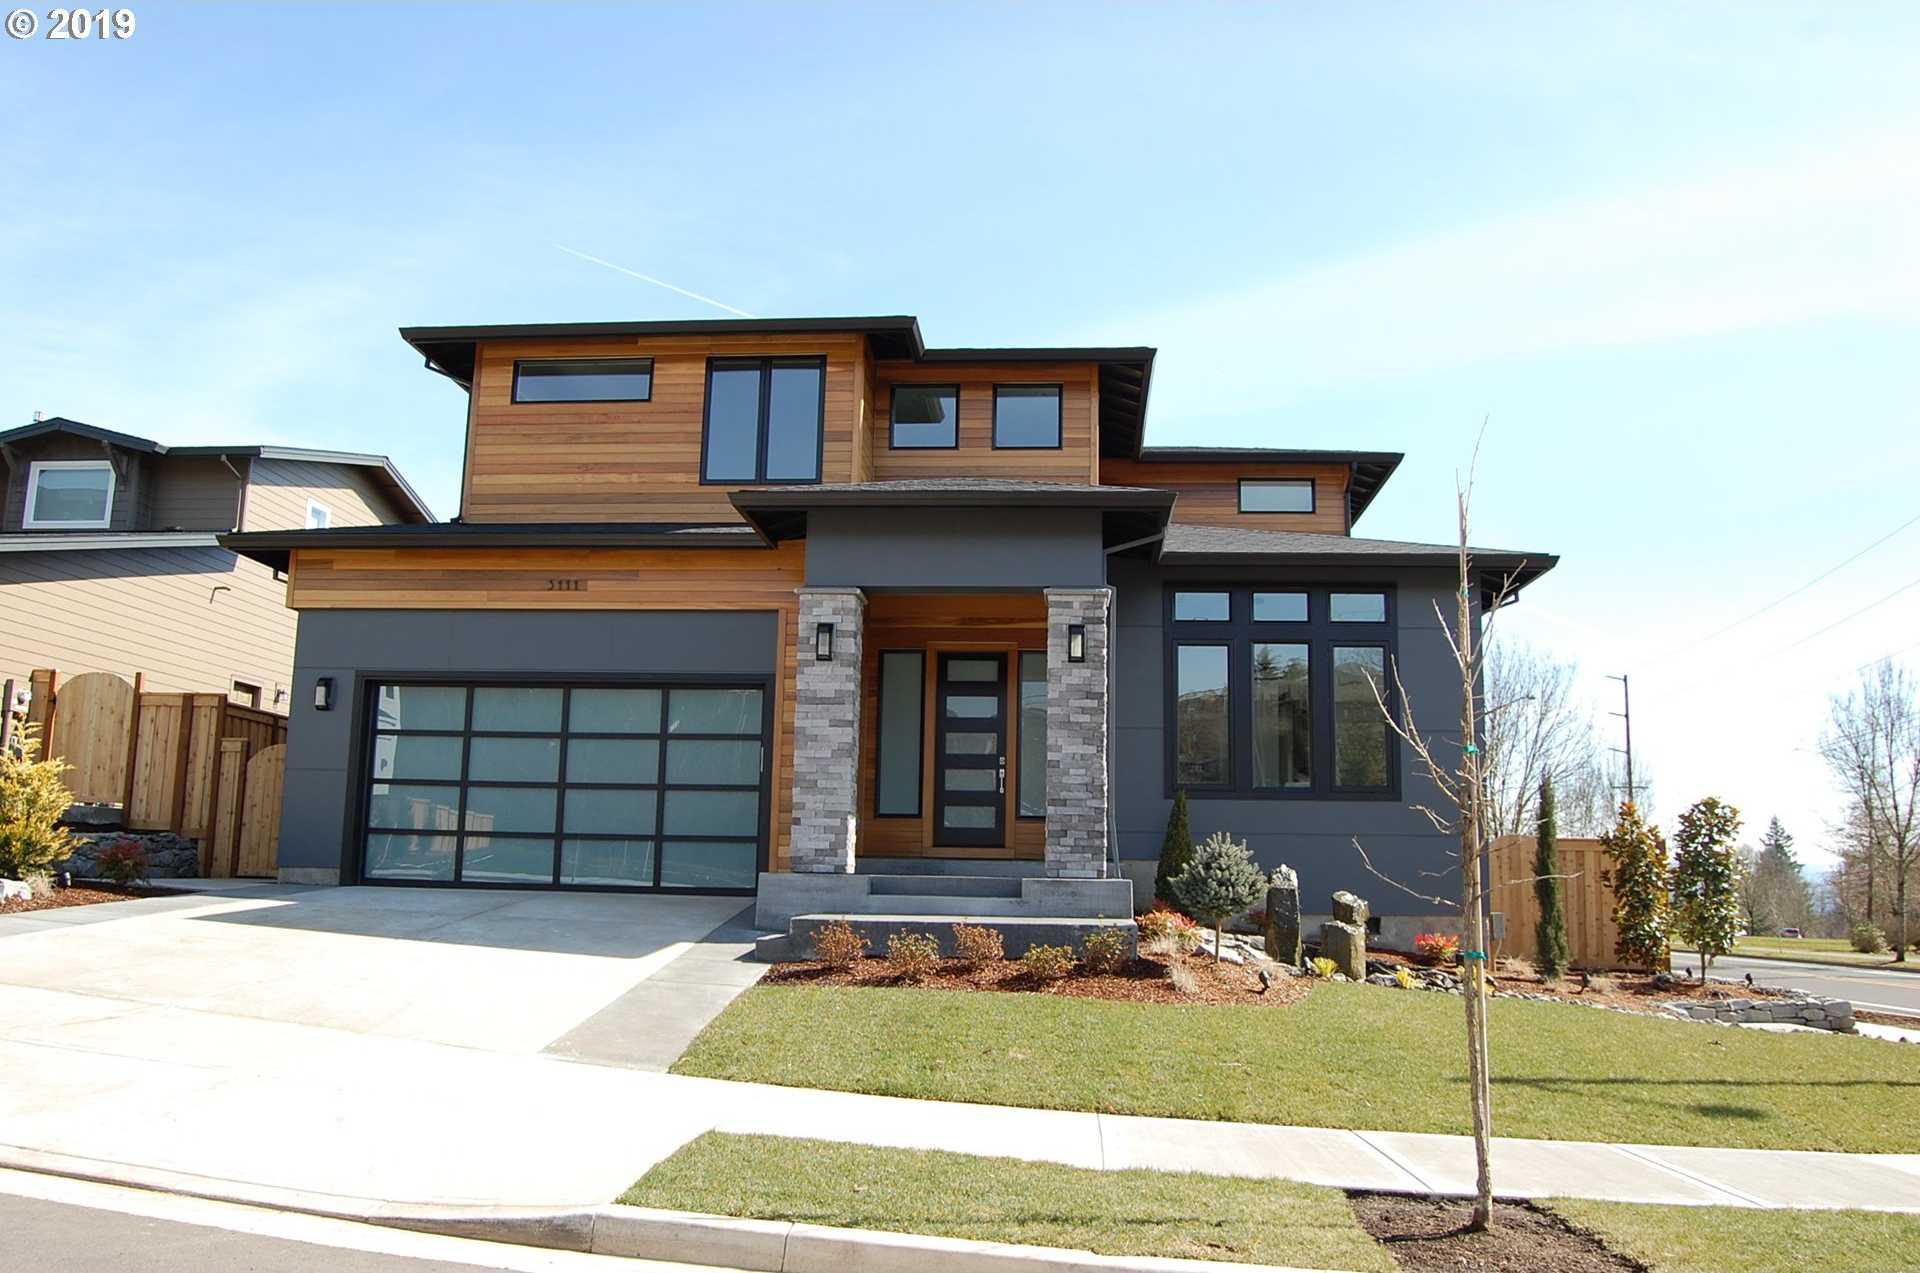 $929,900 - 4Br/4Ba -  for Sale in Tanner Ridge, West Linn